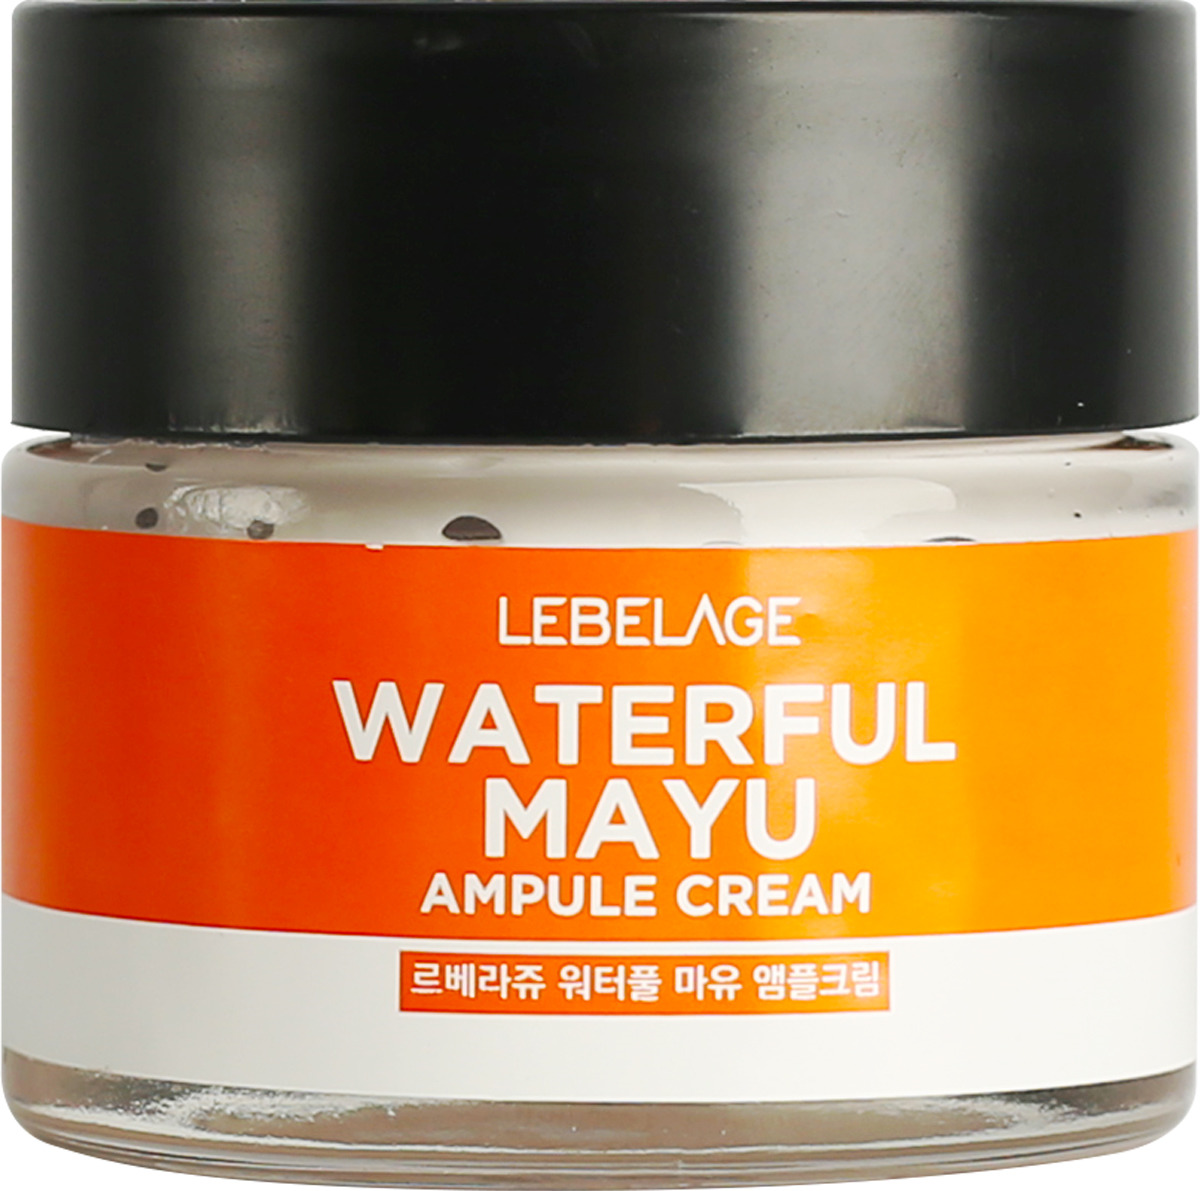 Крем для ухода за кожей Lebelage, ампульный, с лошадиным маслом, 70 мл Lebelage